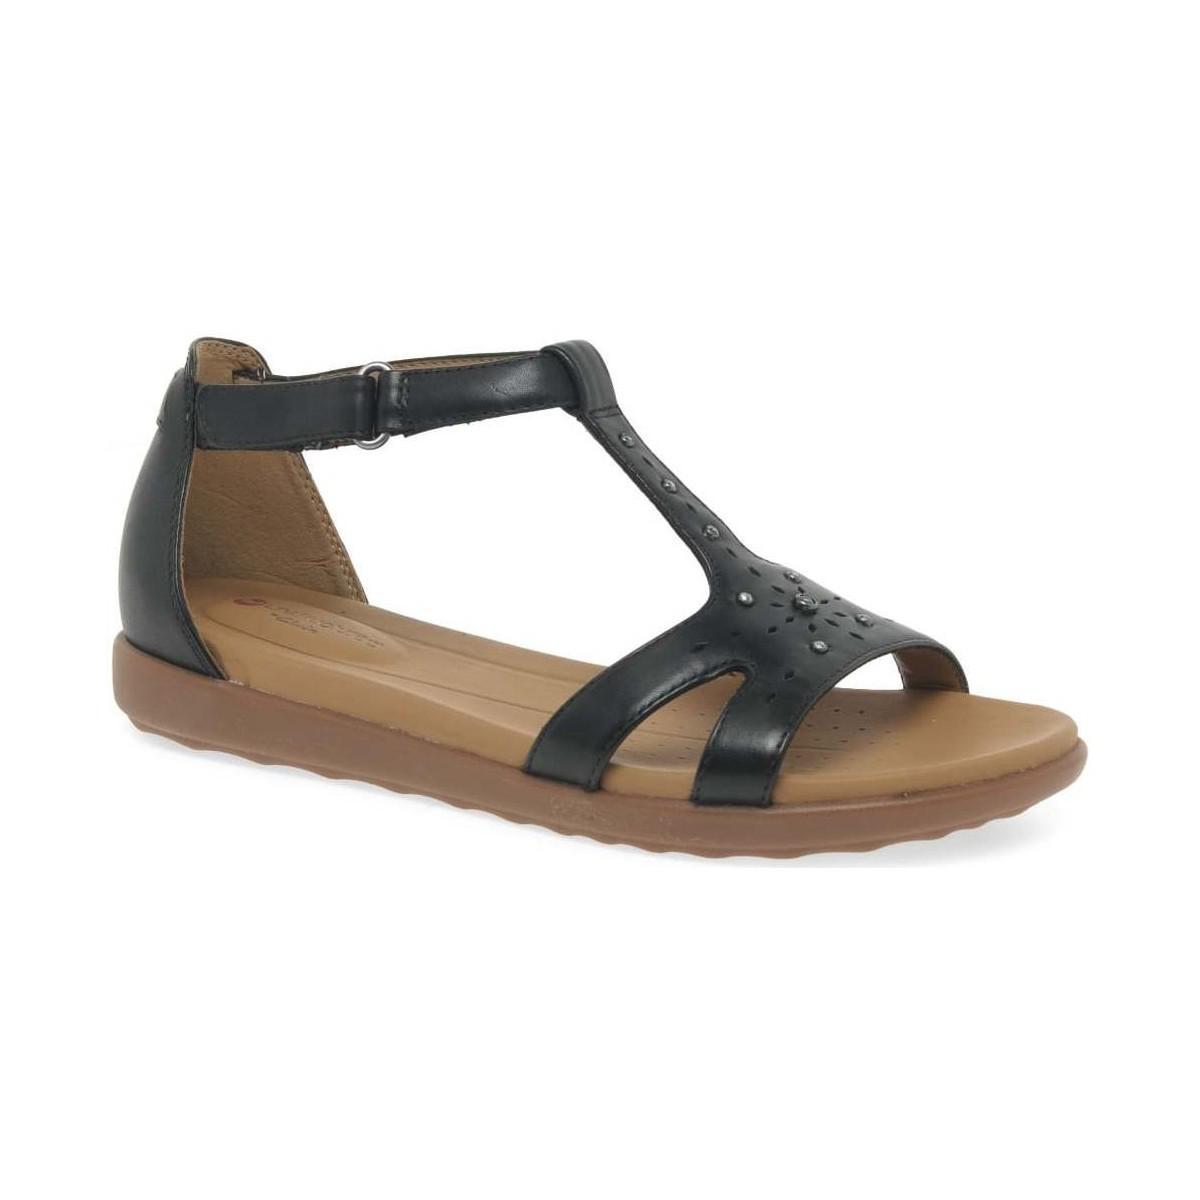 97c755f501c179 Clarks Un Reisel Womens Studded Sandals Women s Sandals In Black in ...